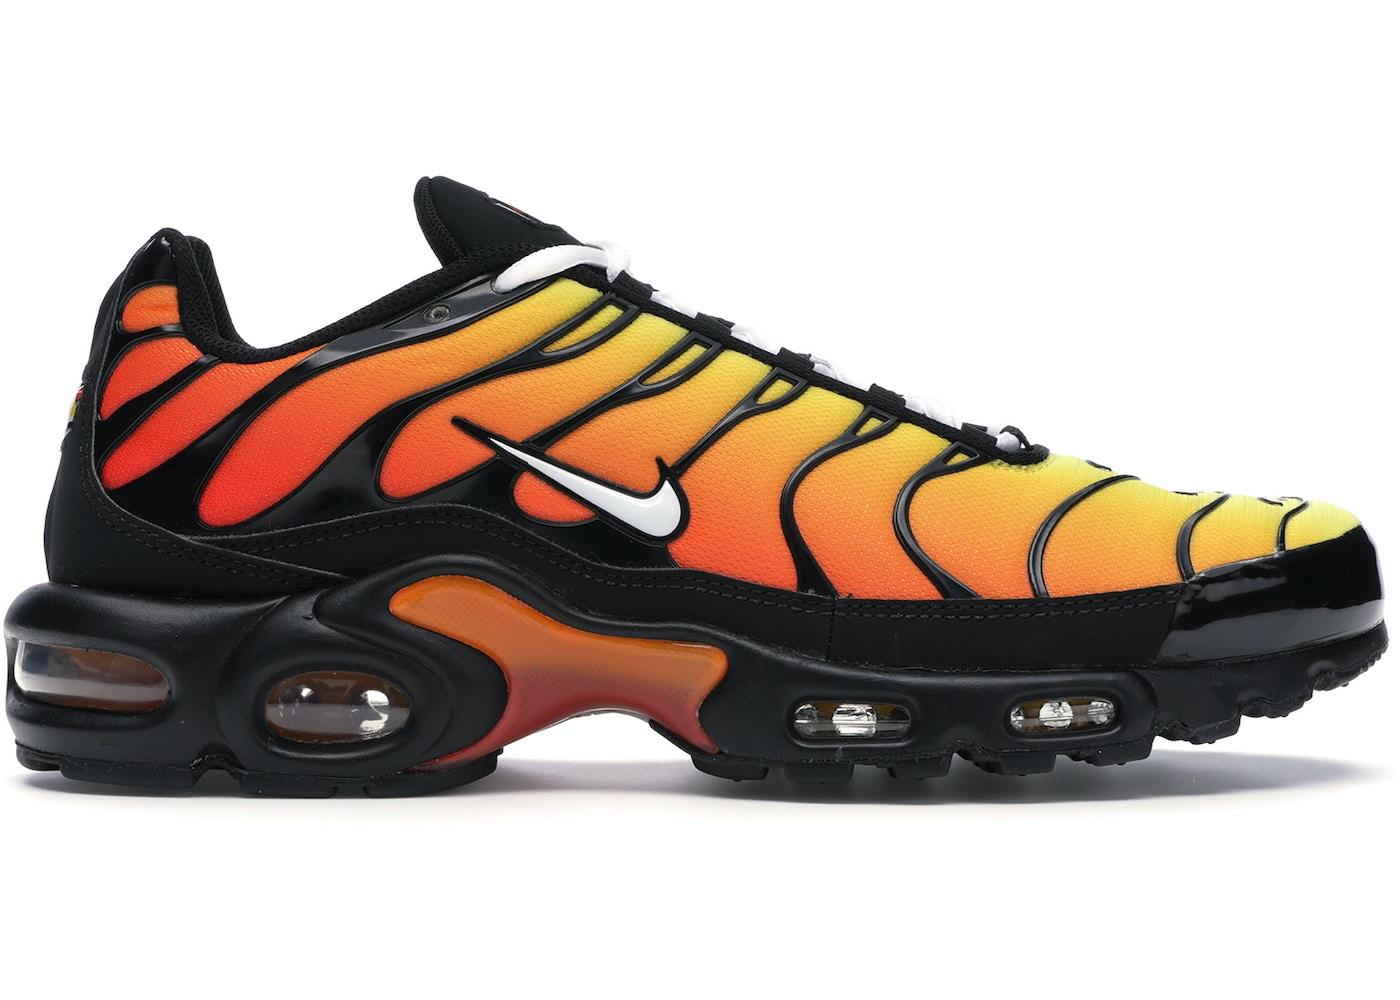 Software Caratterizzare stanco  Nike Air Max Plus Tiger - 852630-040